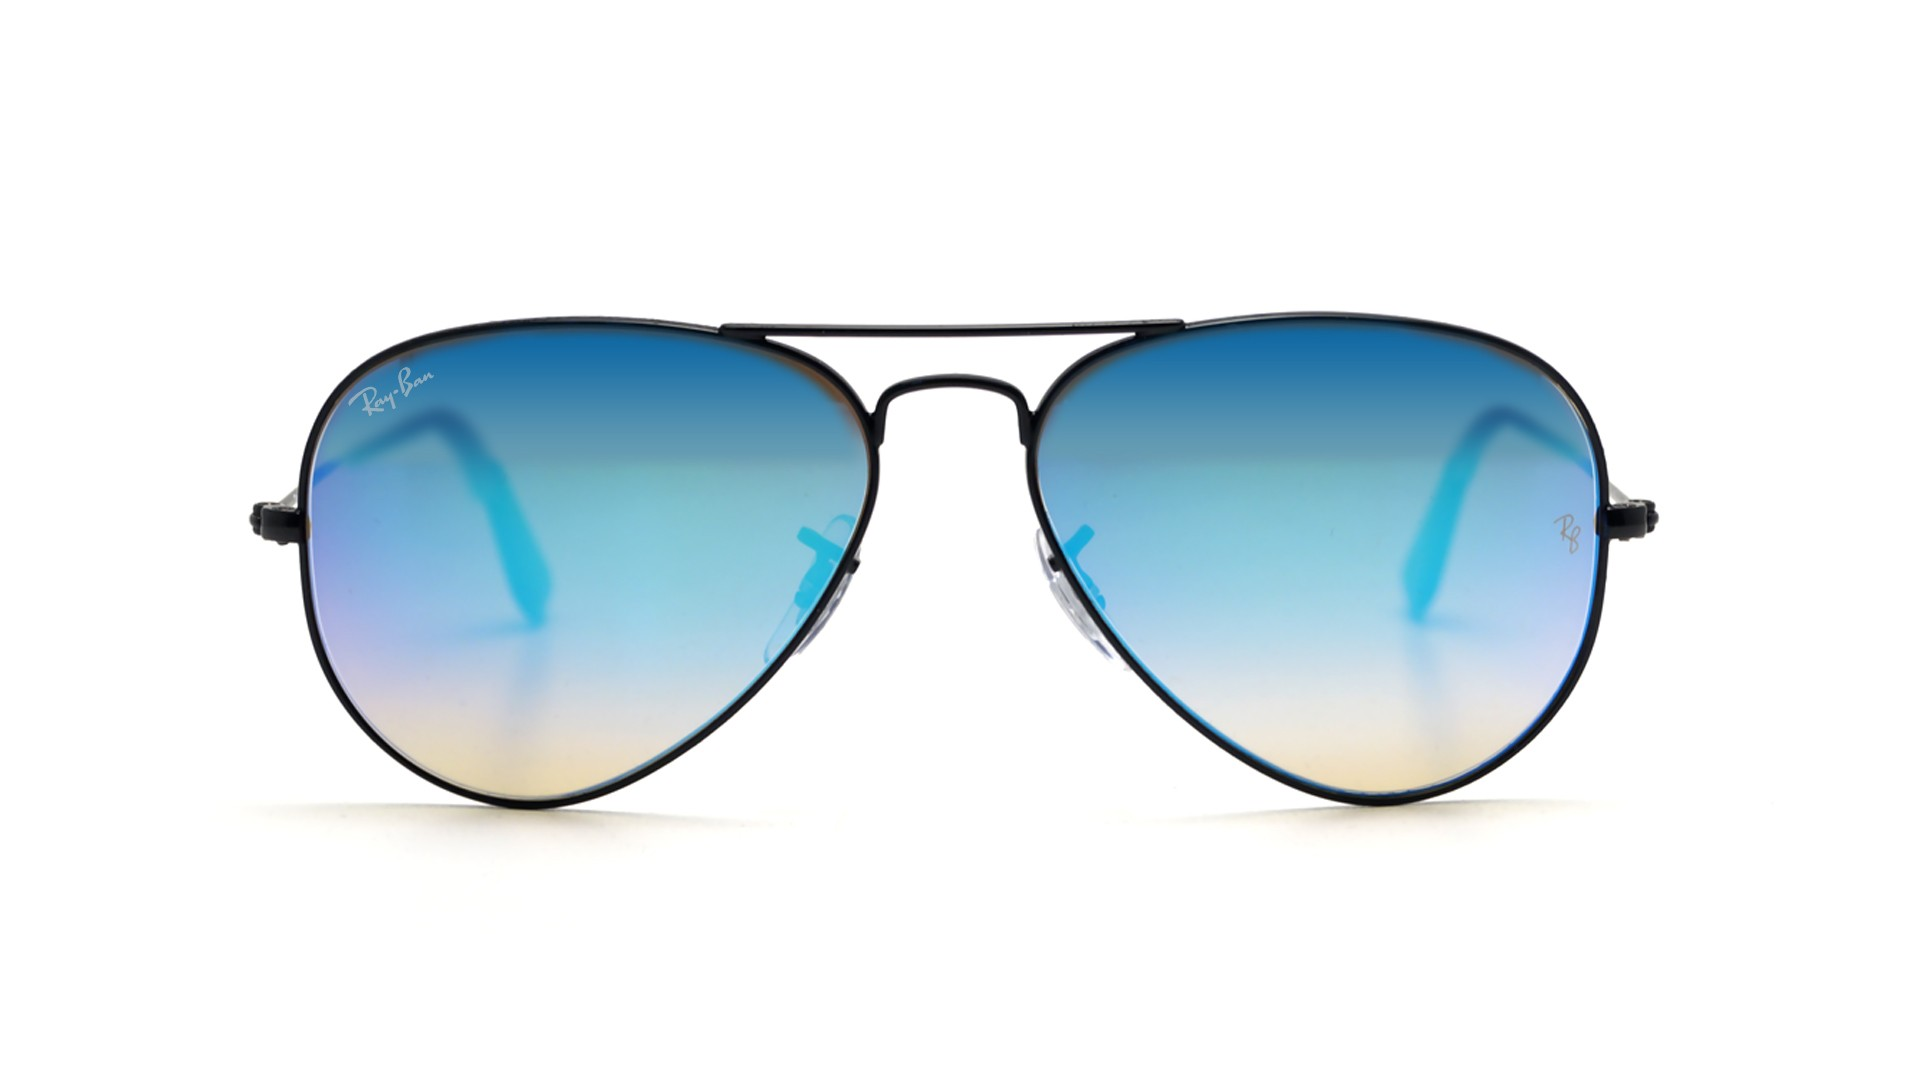 Ray ban aviator metal noir rb3025 002 4o 55 14 prix 114 for Lunettes de soleil ray ban aviator miroir